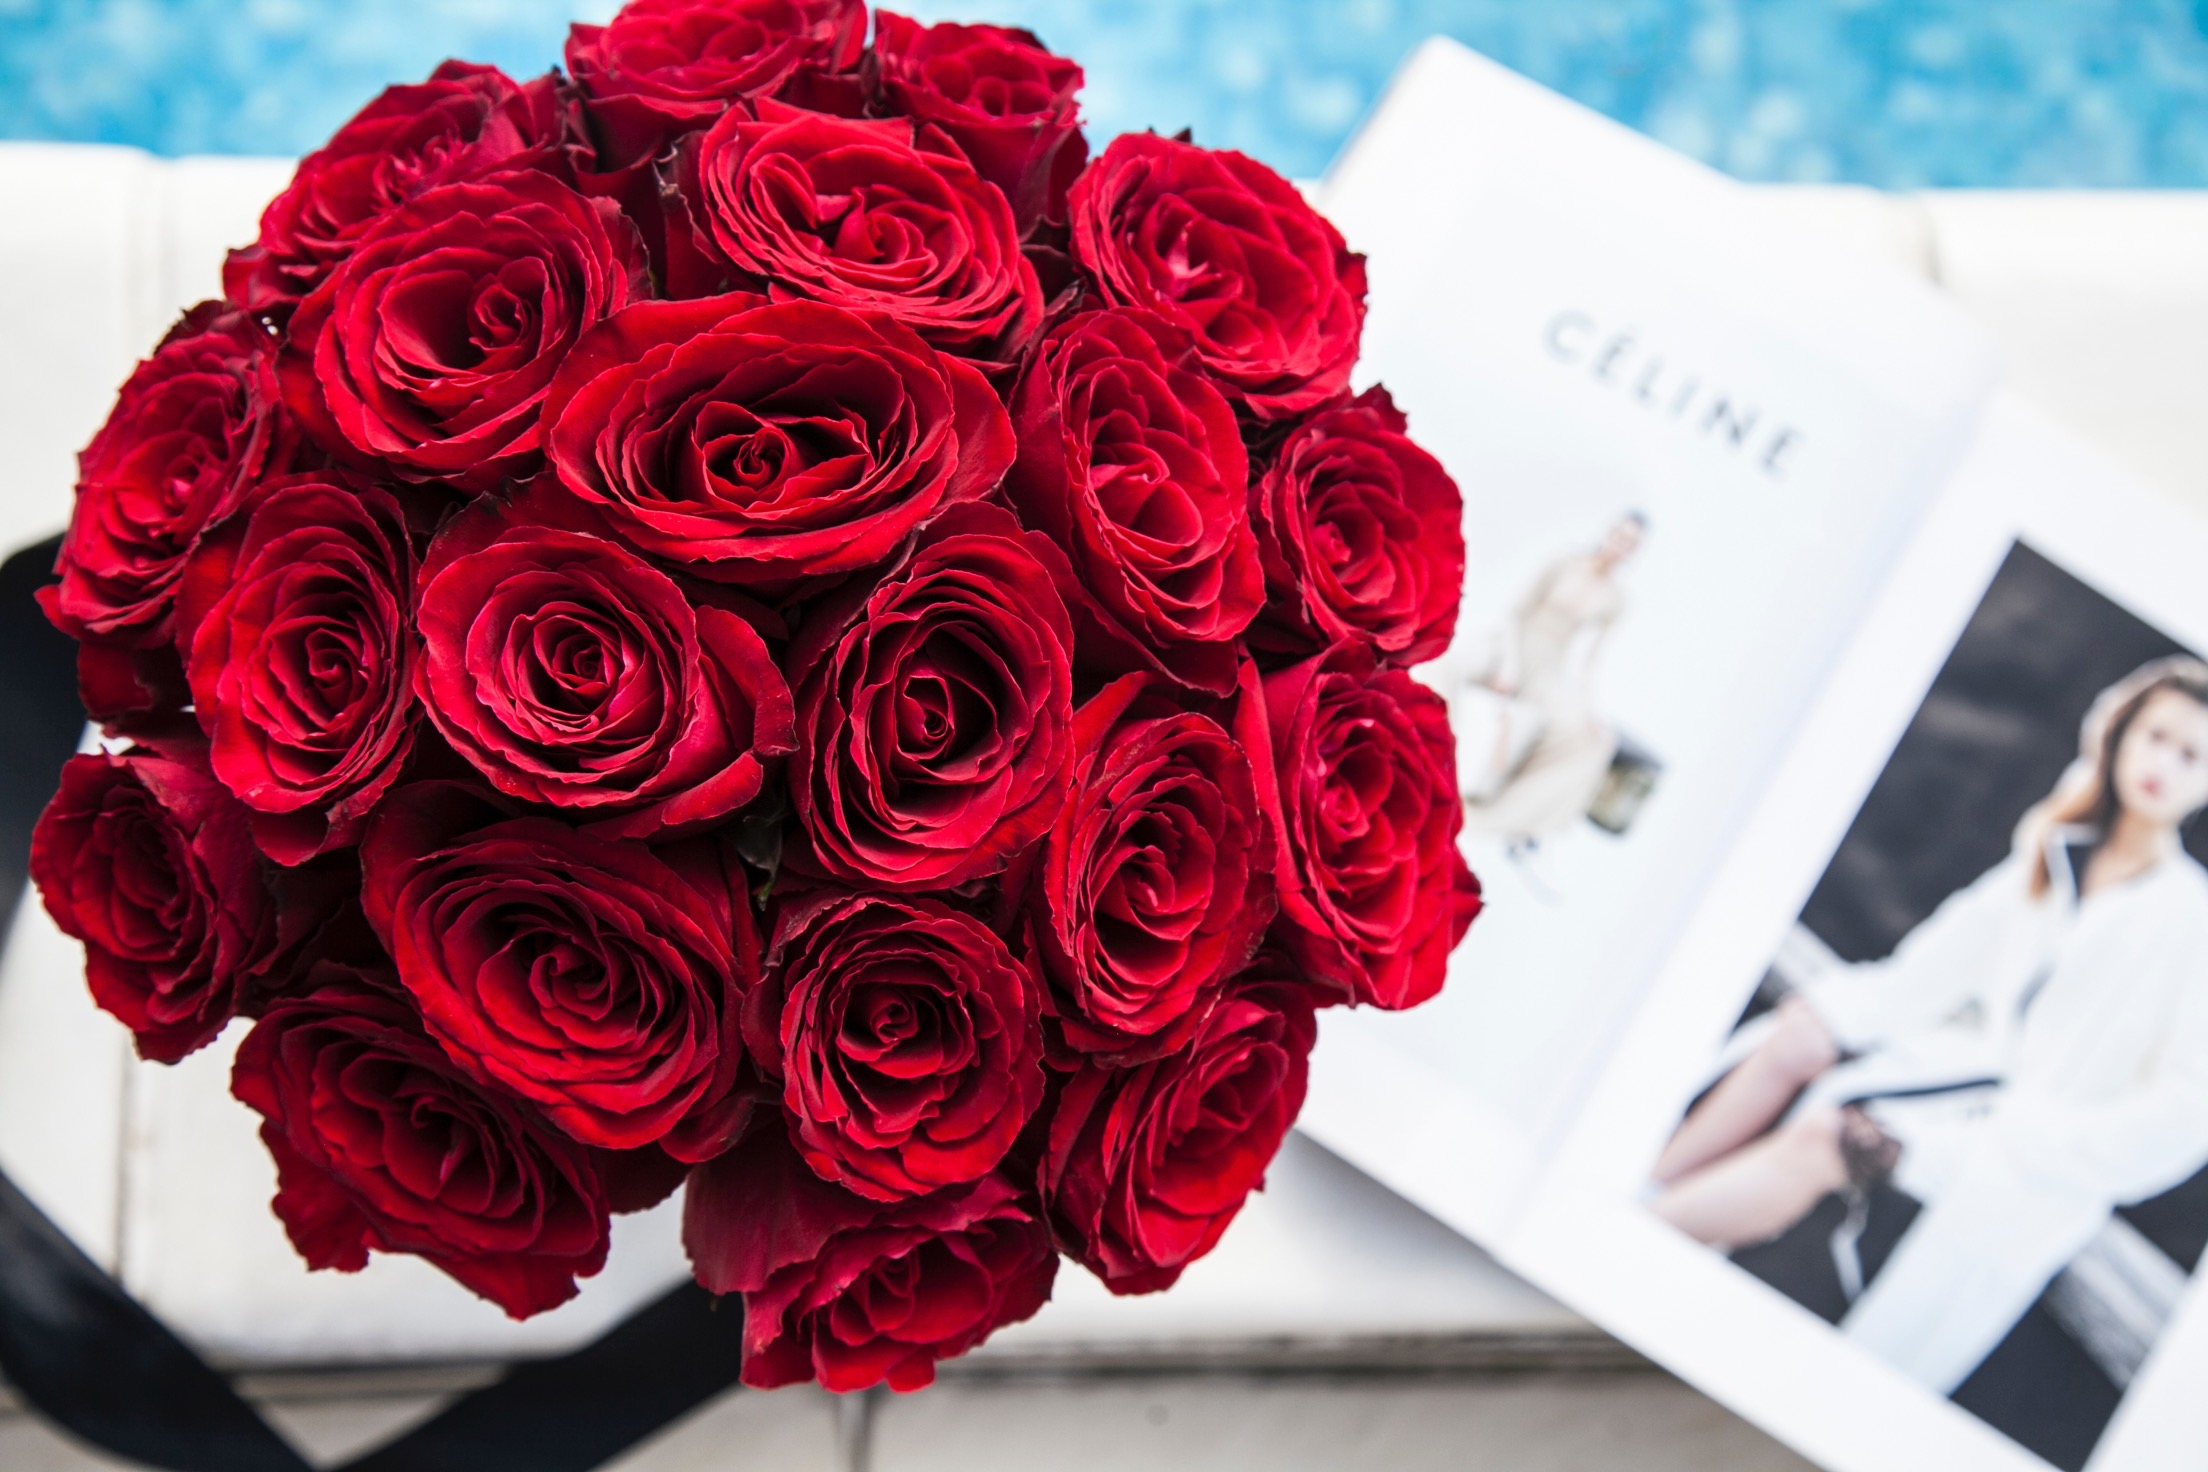 Cvece - Crveni ruze u kutiji